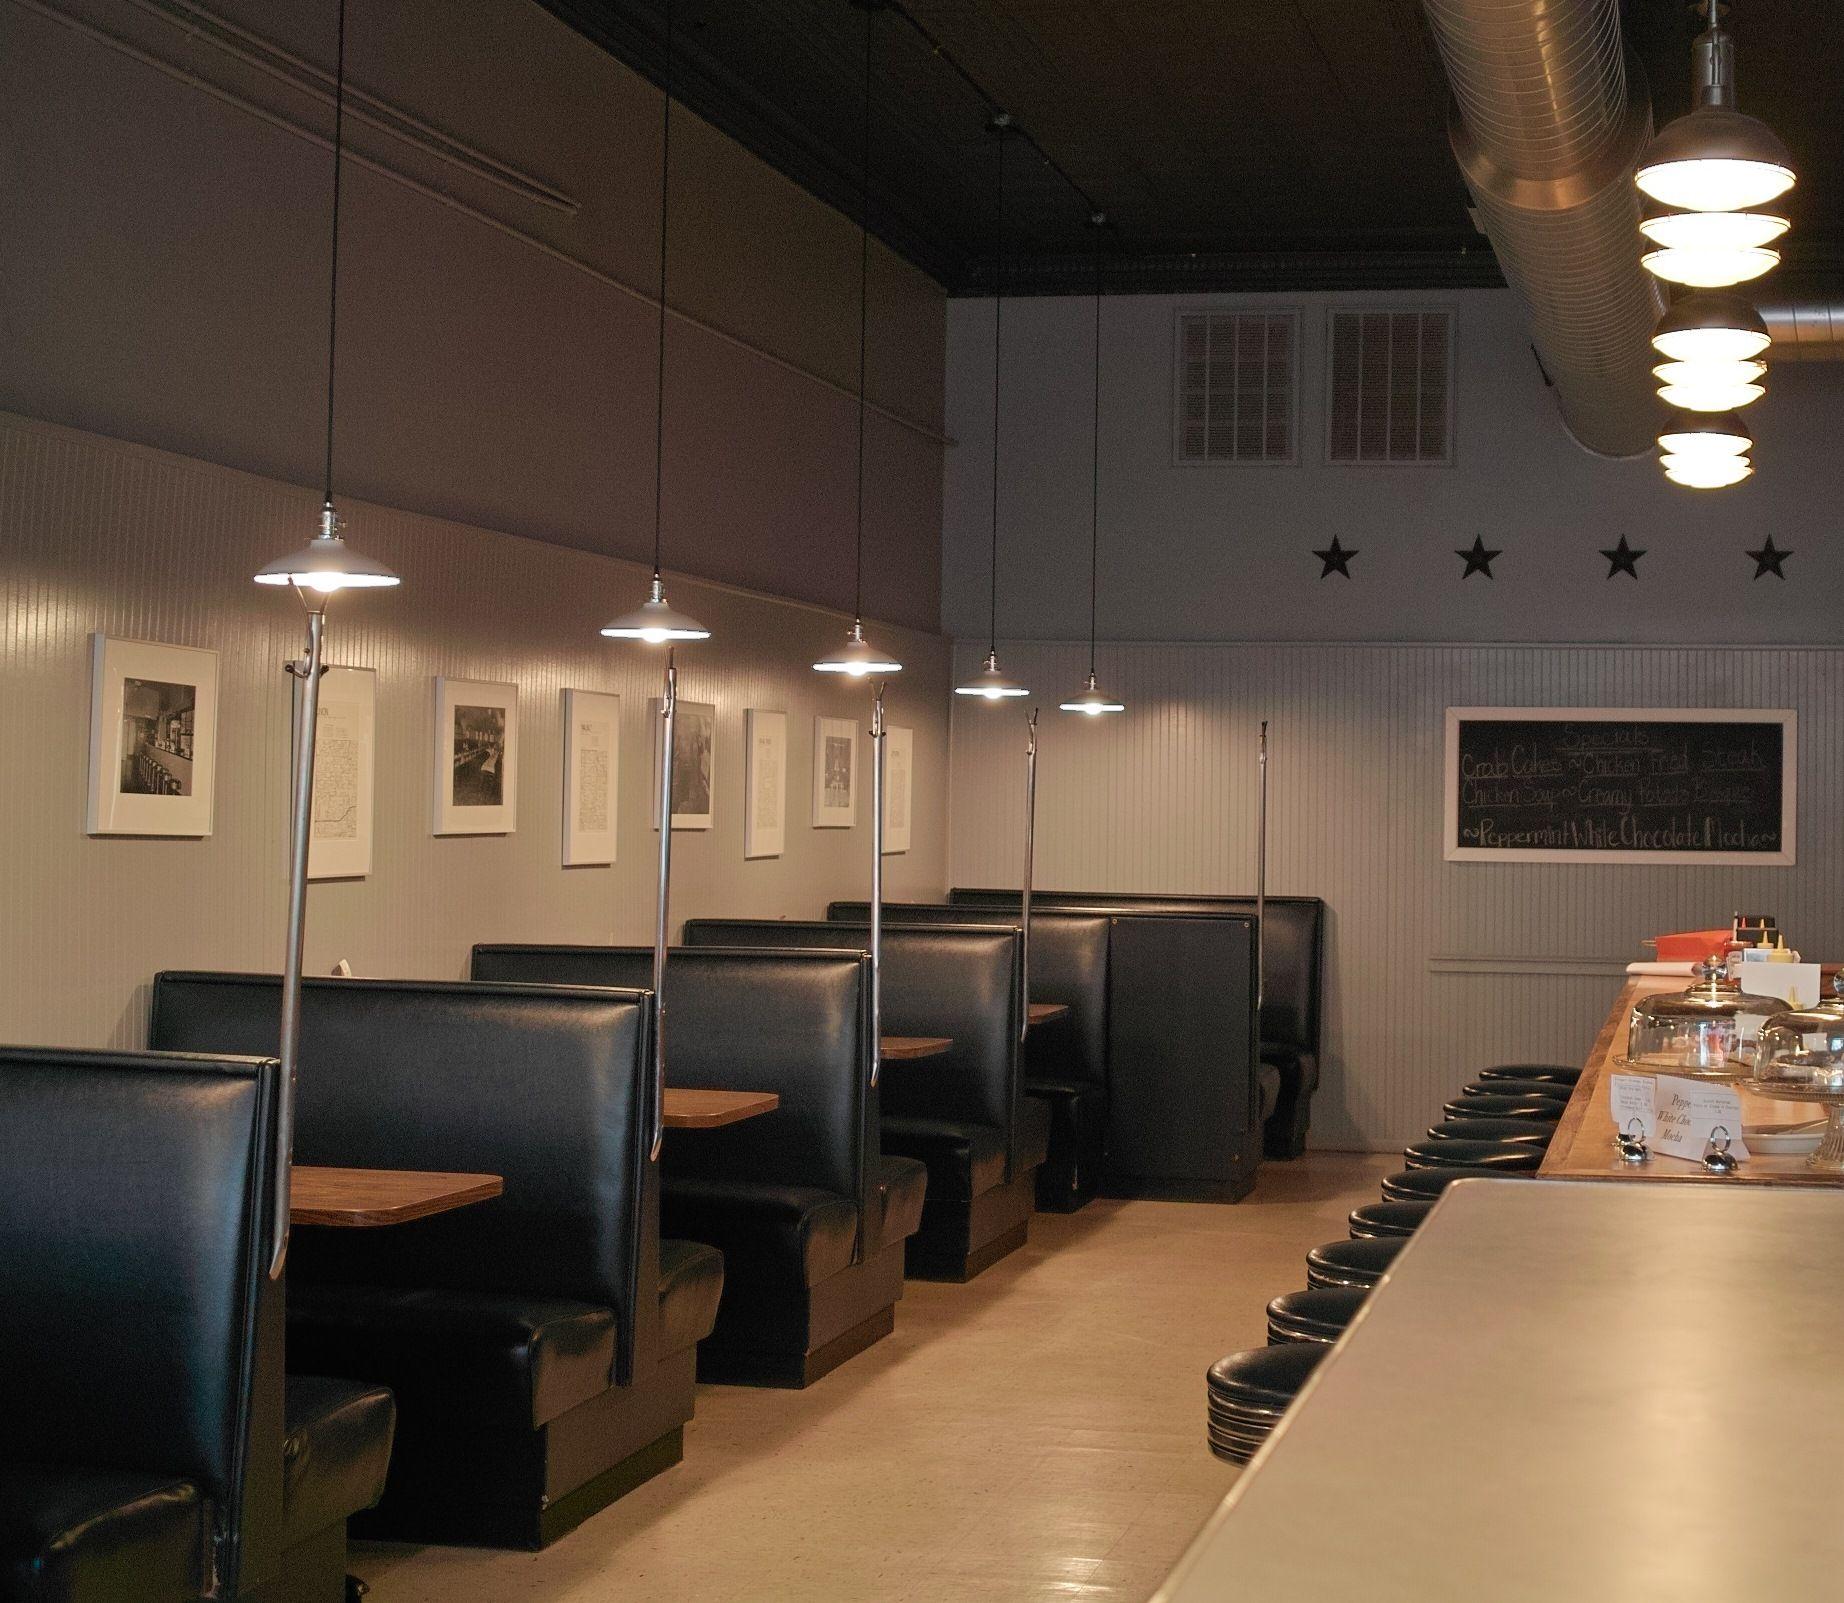 Ceiling And Lighting Ideas Red Kitchen Lights Unusual Bar: Amusing Darkslategray Interior Hanging Lights Ideas